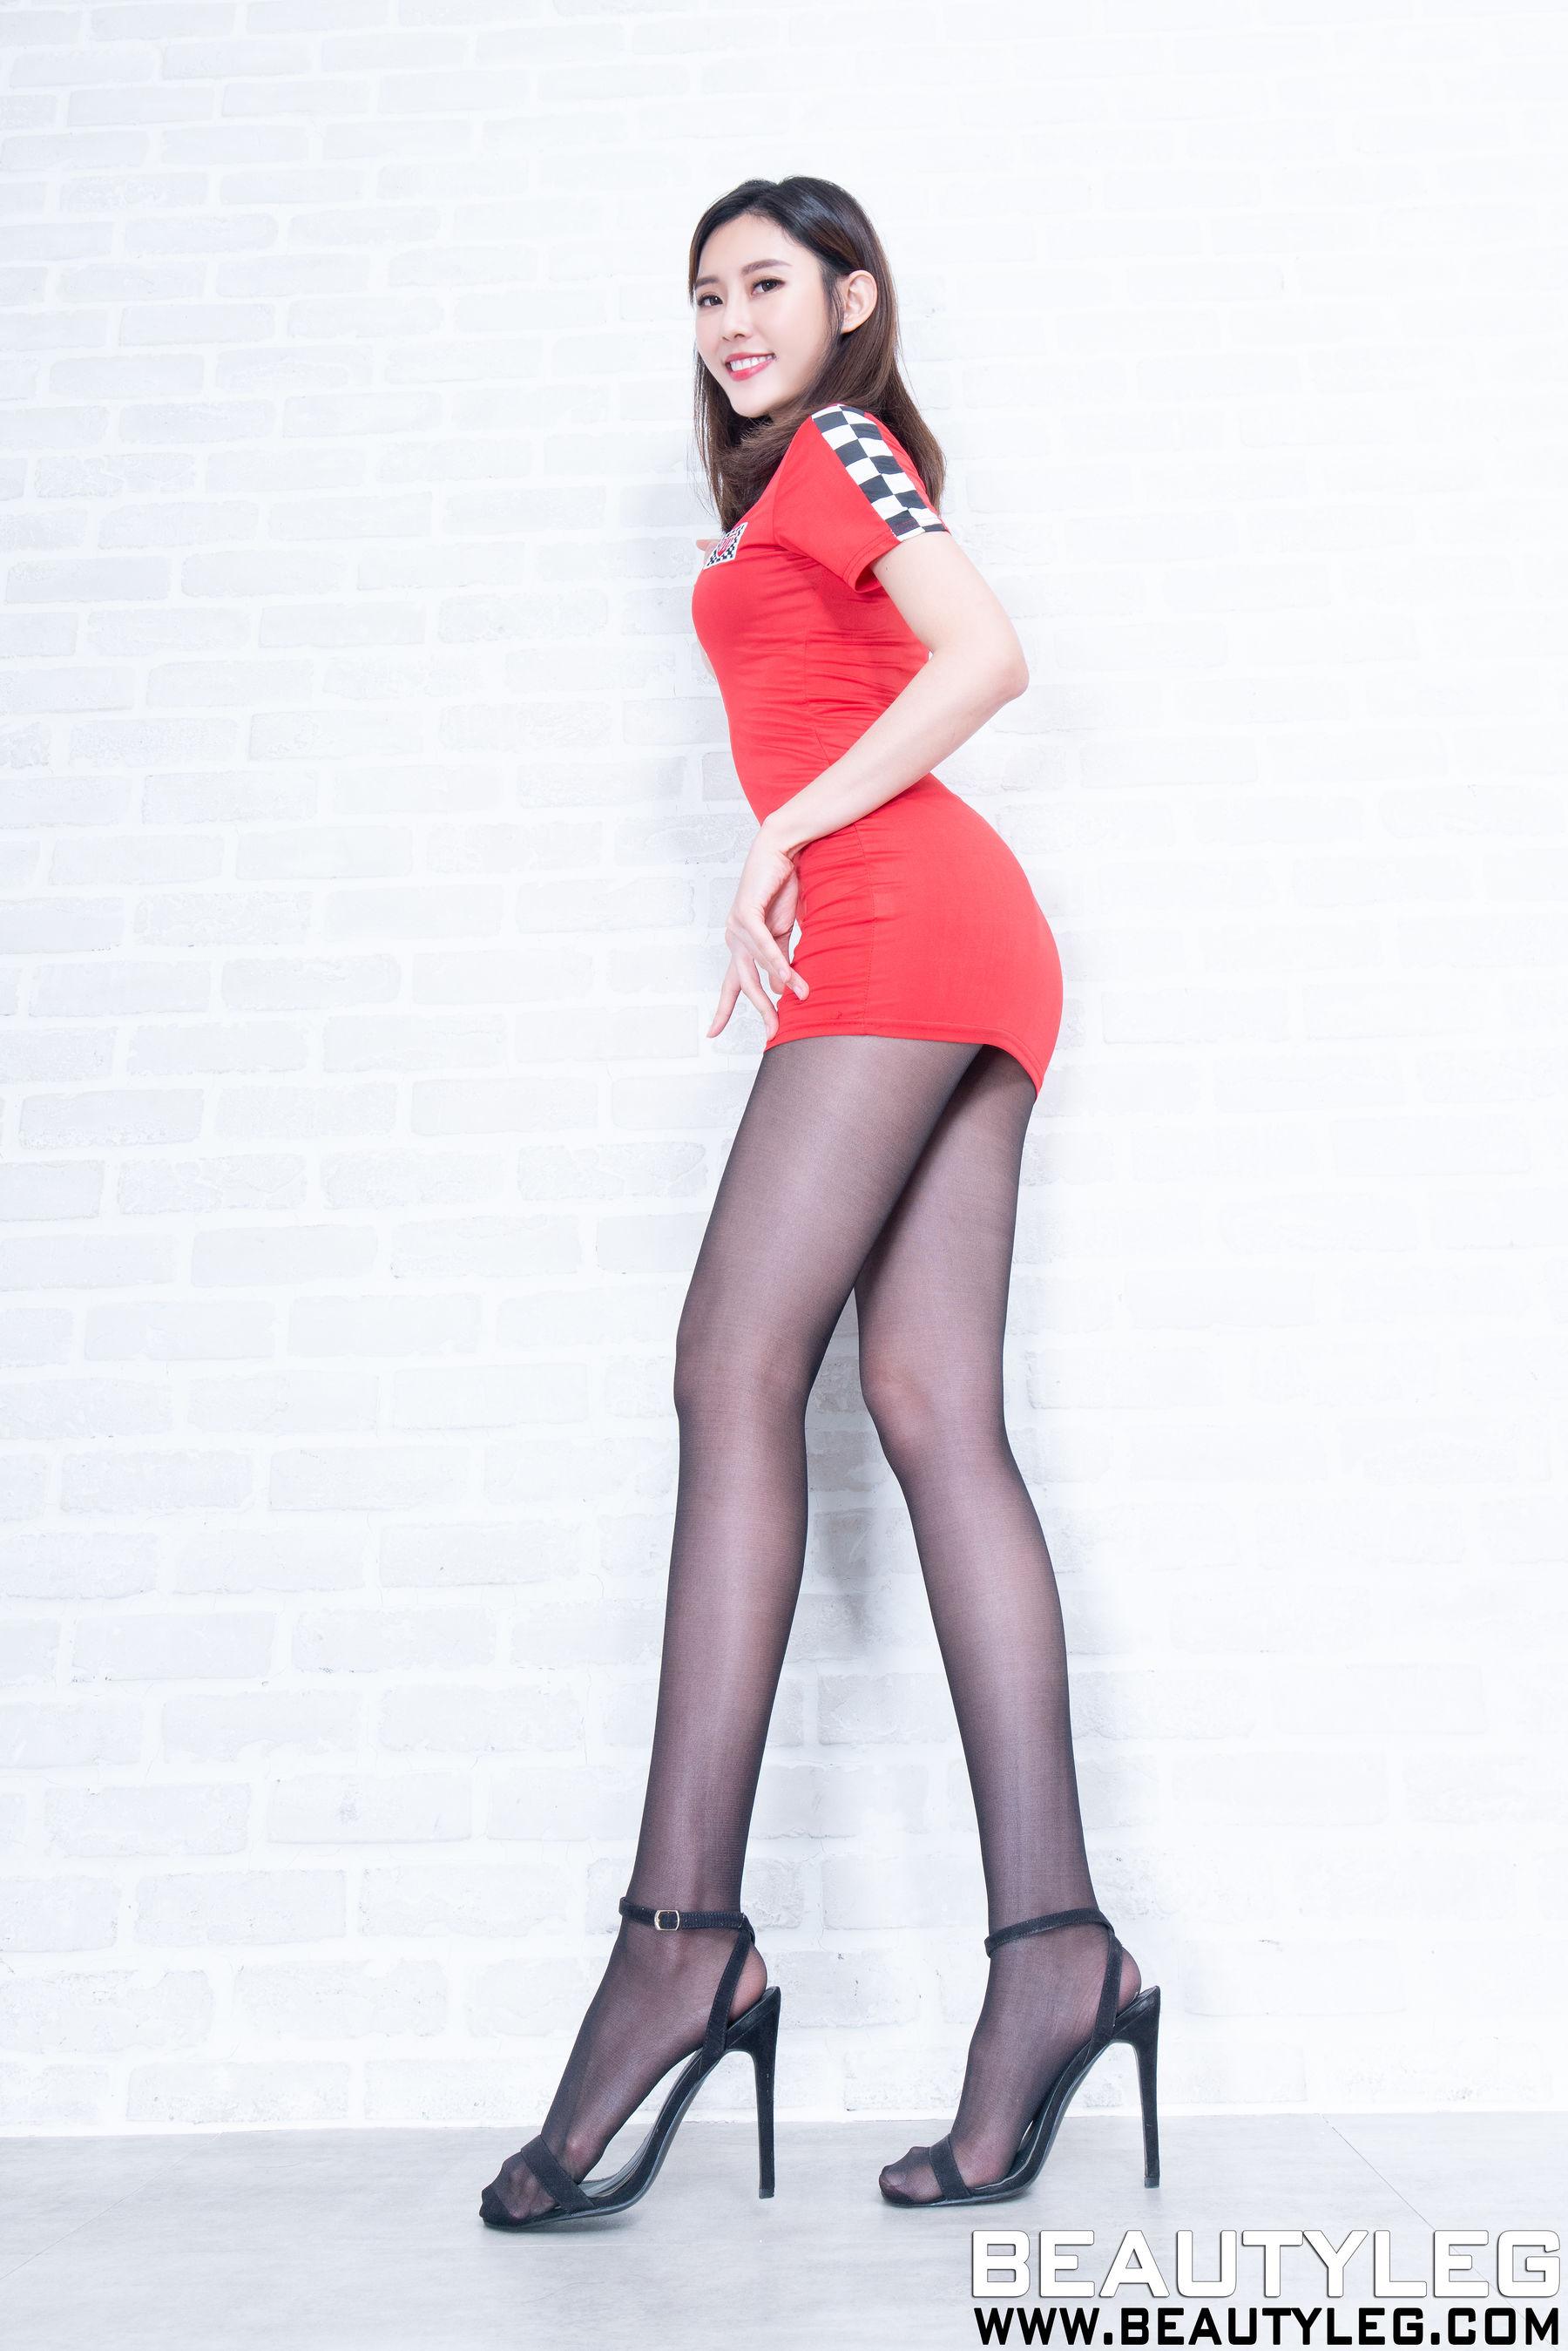 VOL.1913 [Beautyleg]丝袜美腿黑丝:郭珉妏(腿模Queenie)超高清个人性感漂亮大图(45P)